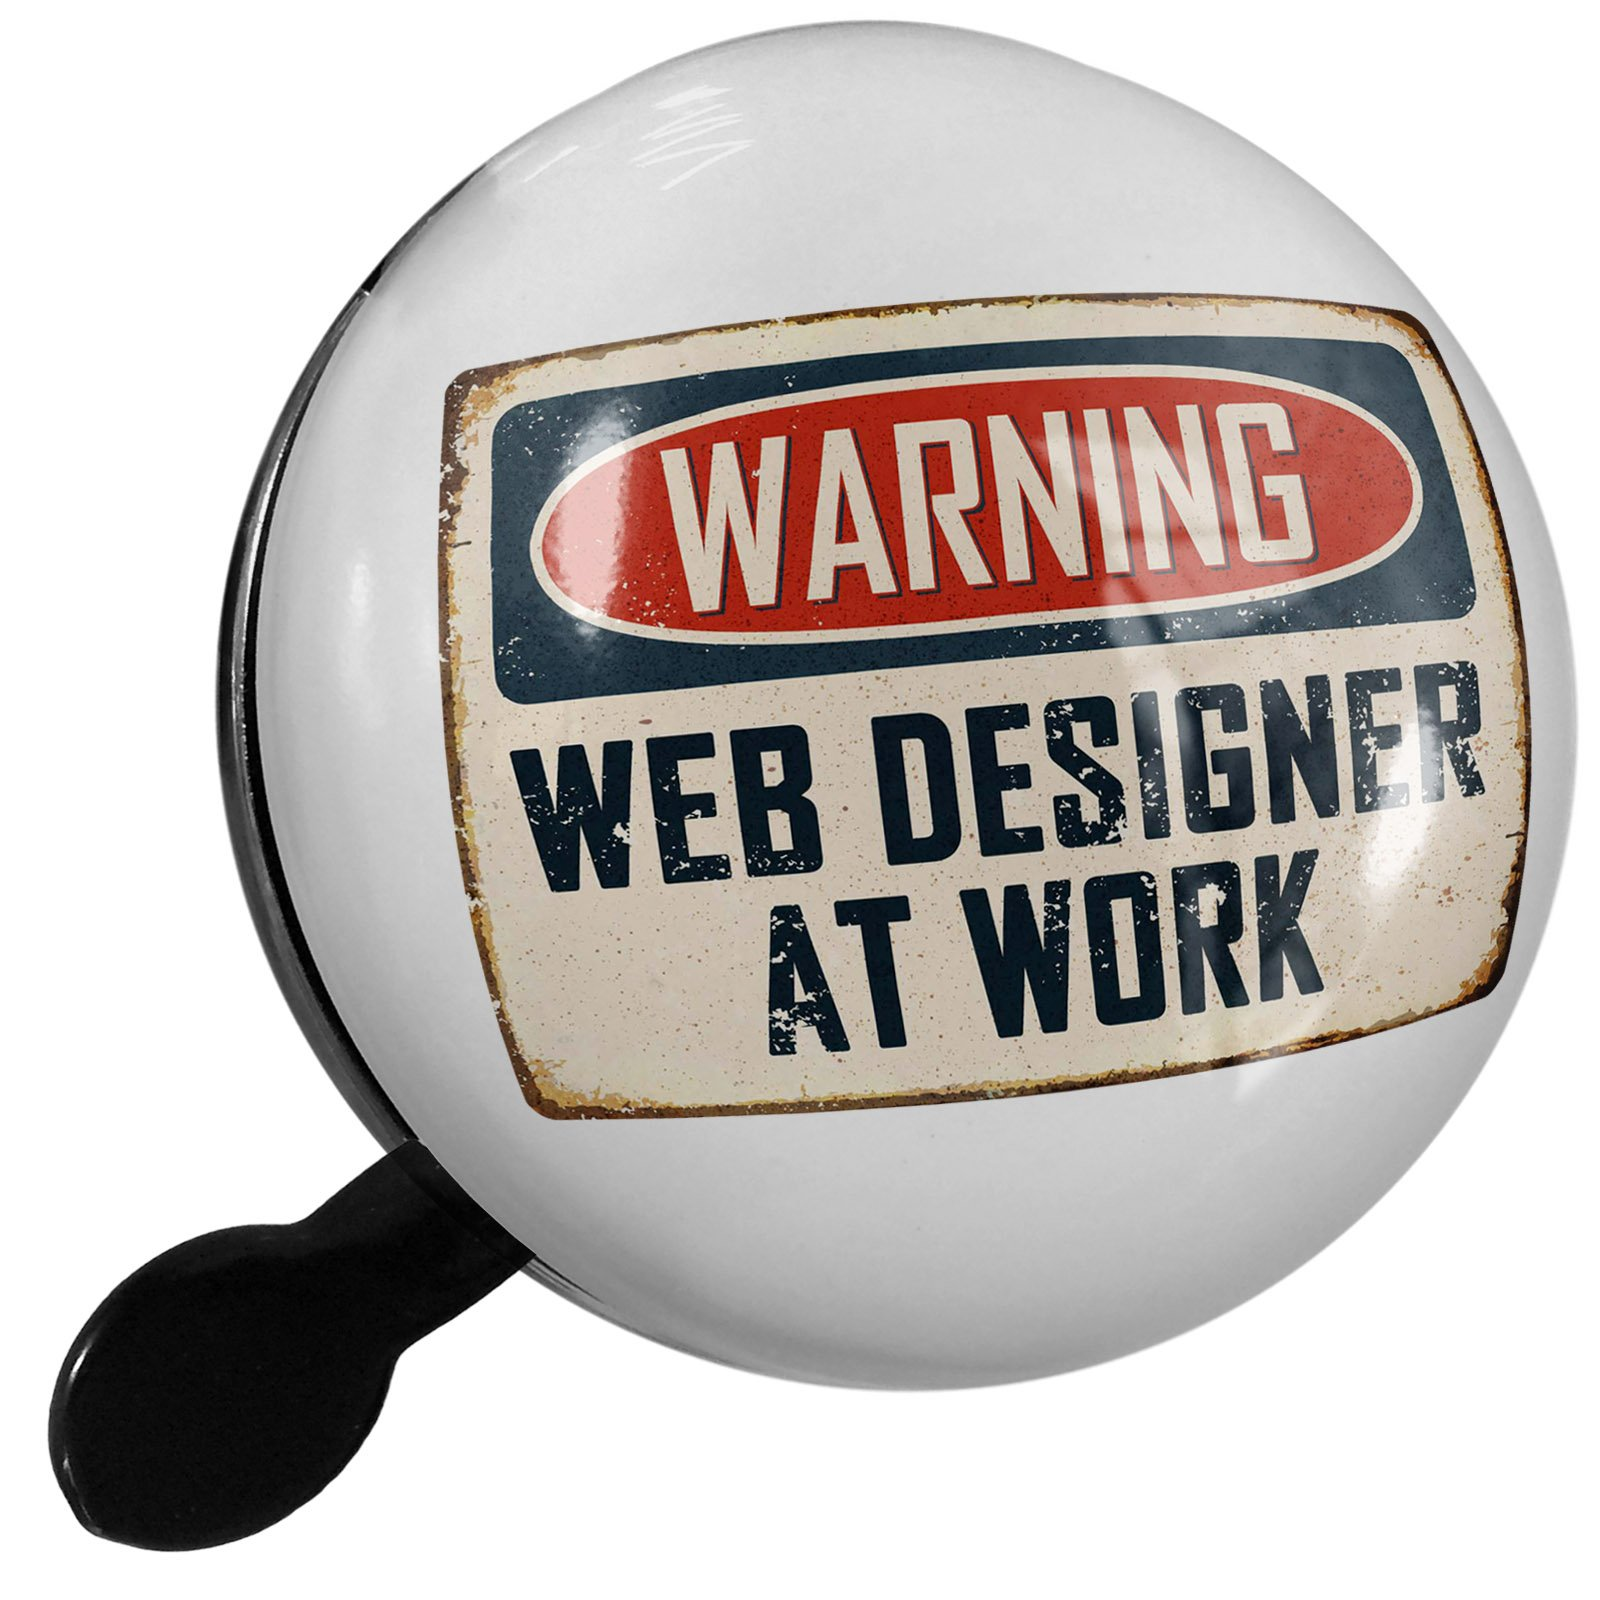 Small Bike Bell Warning Web Designer At Work Vintage Fun Job Sign - NEONBLOND